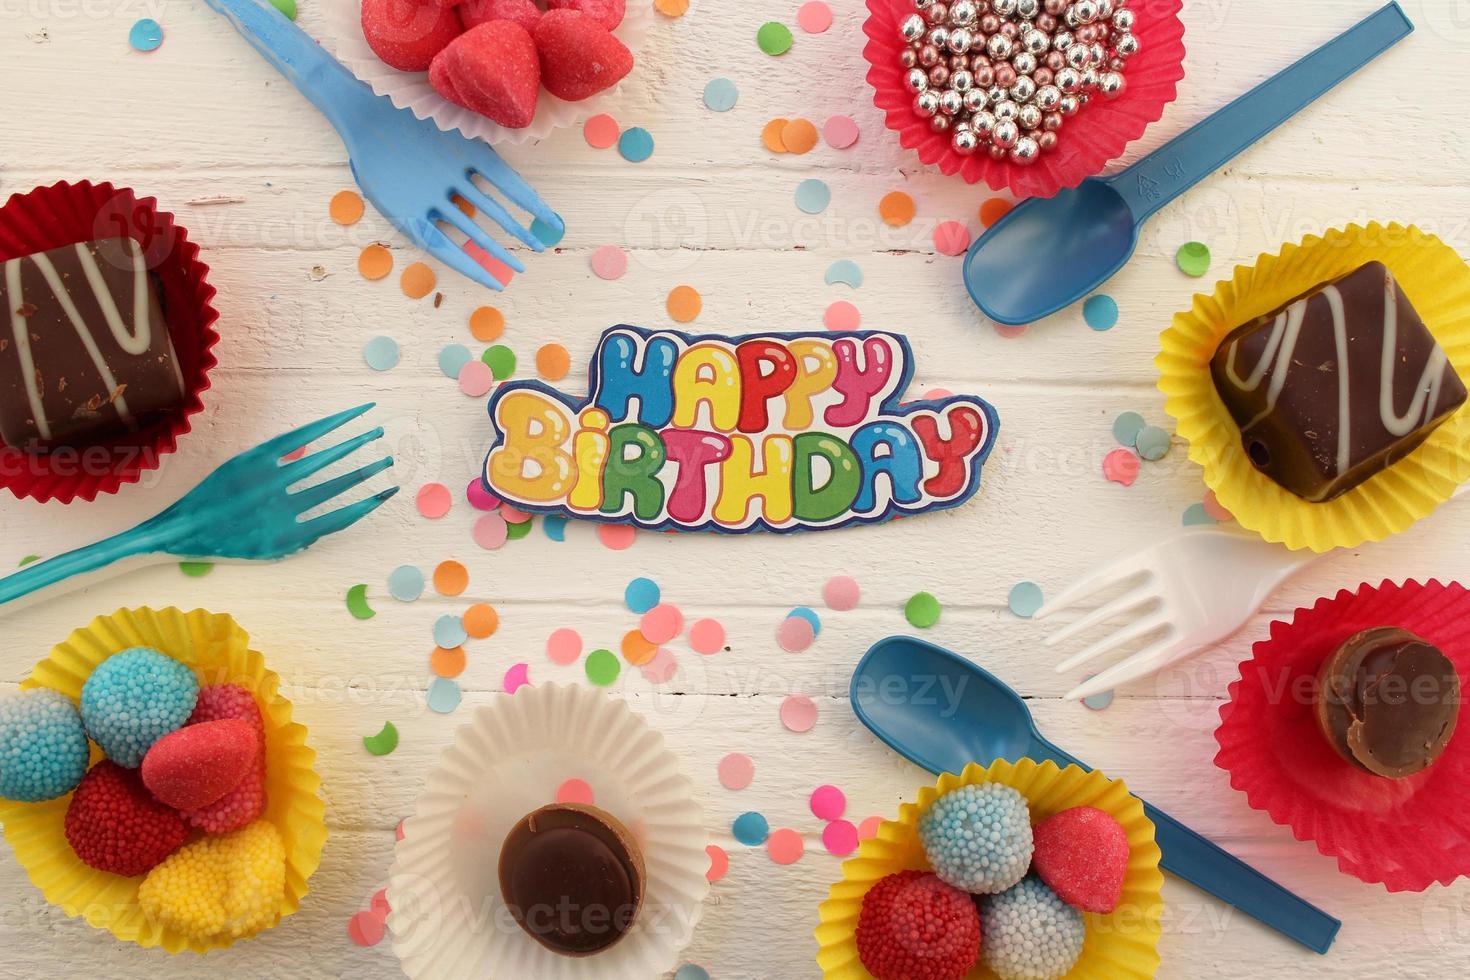 Birthday celebration cupcake and confetti background photo